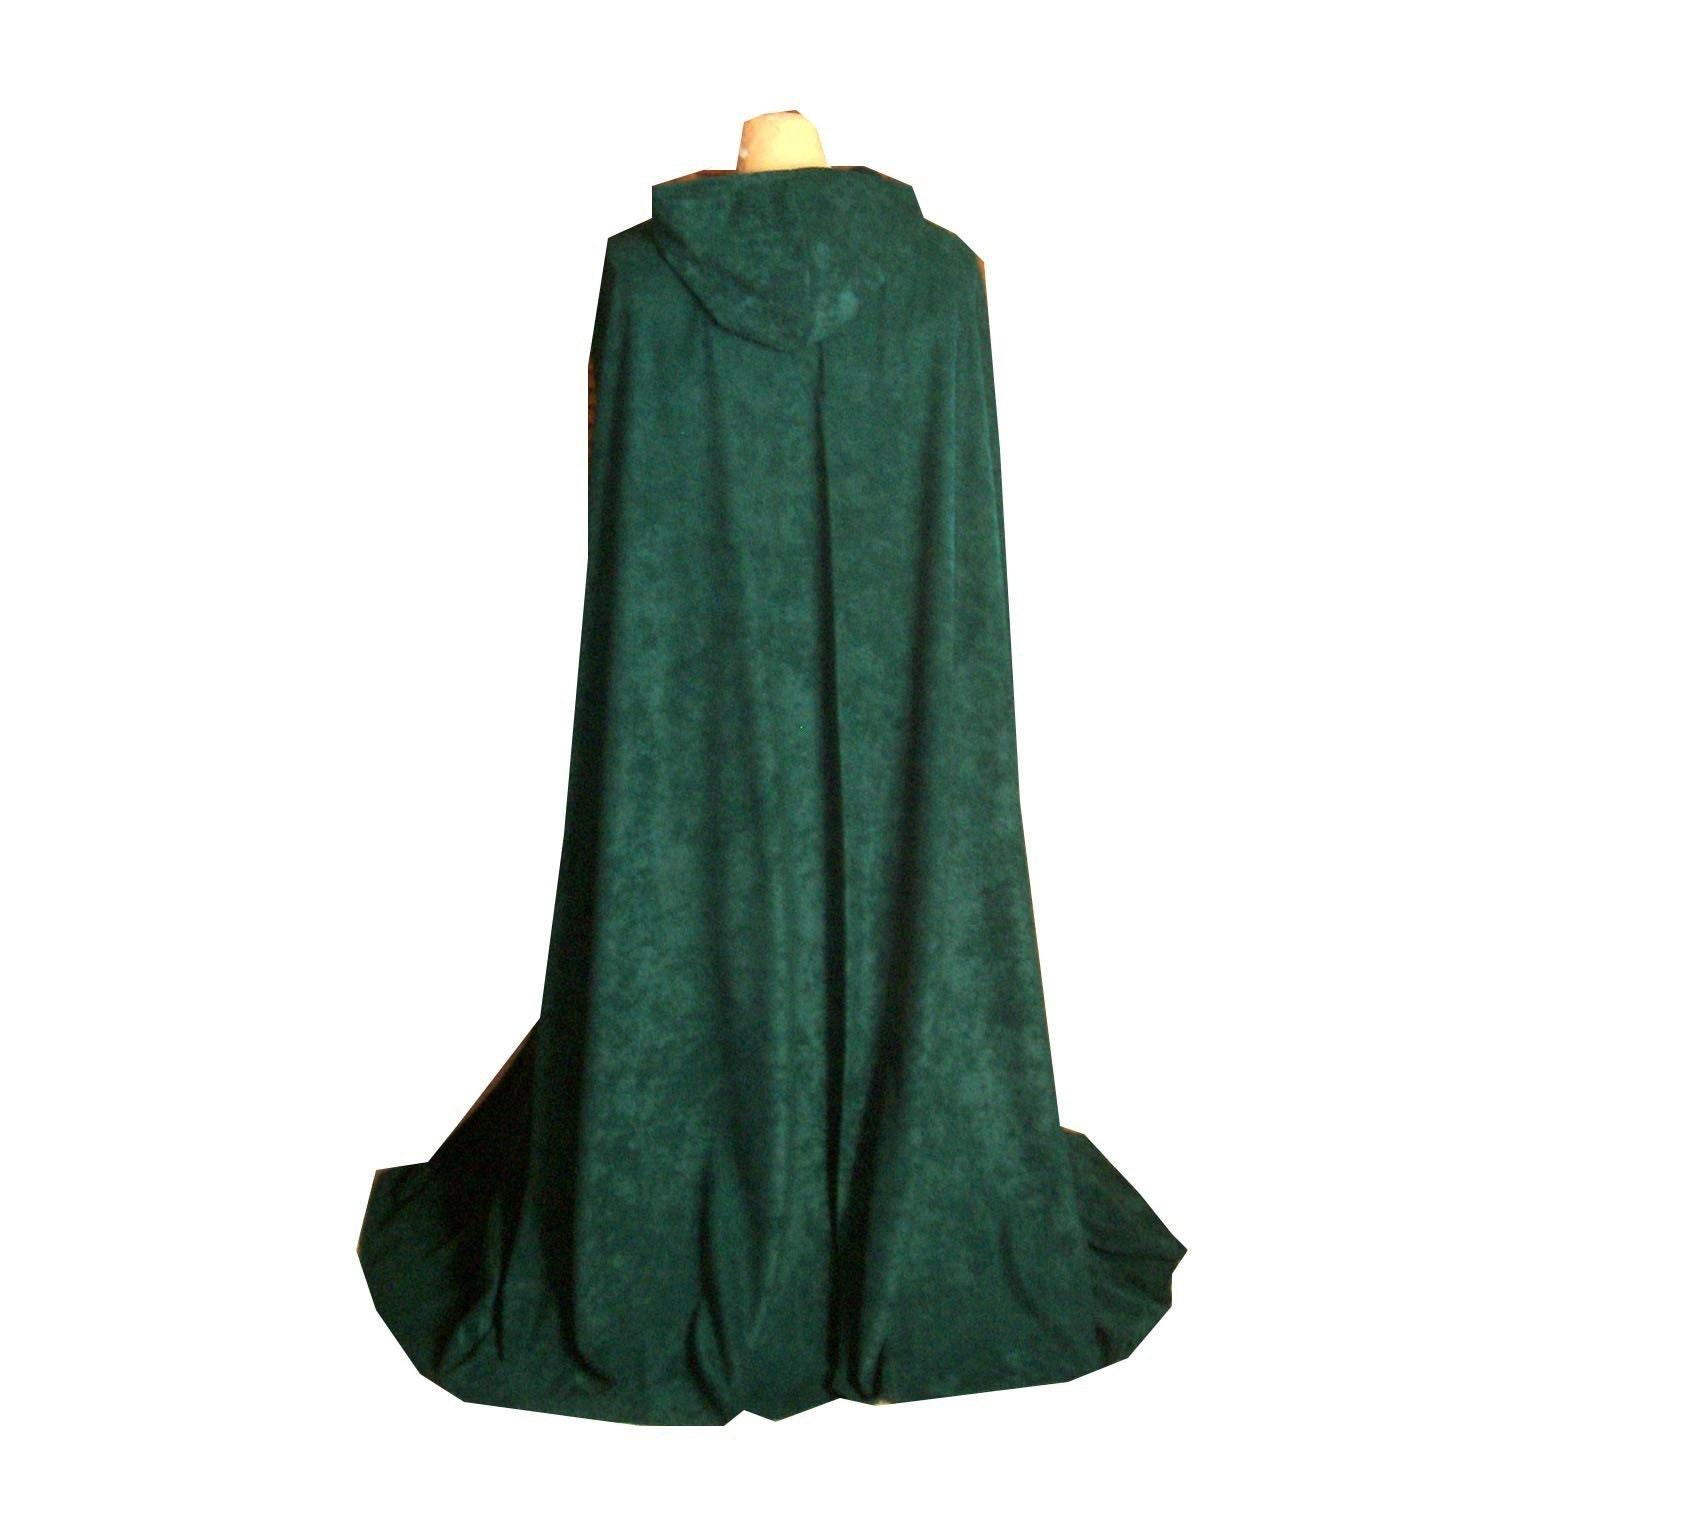 Dark green fleece hooded cloak